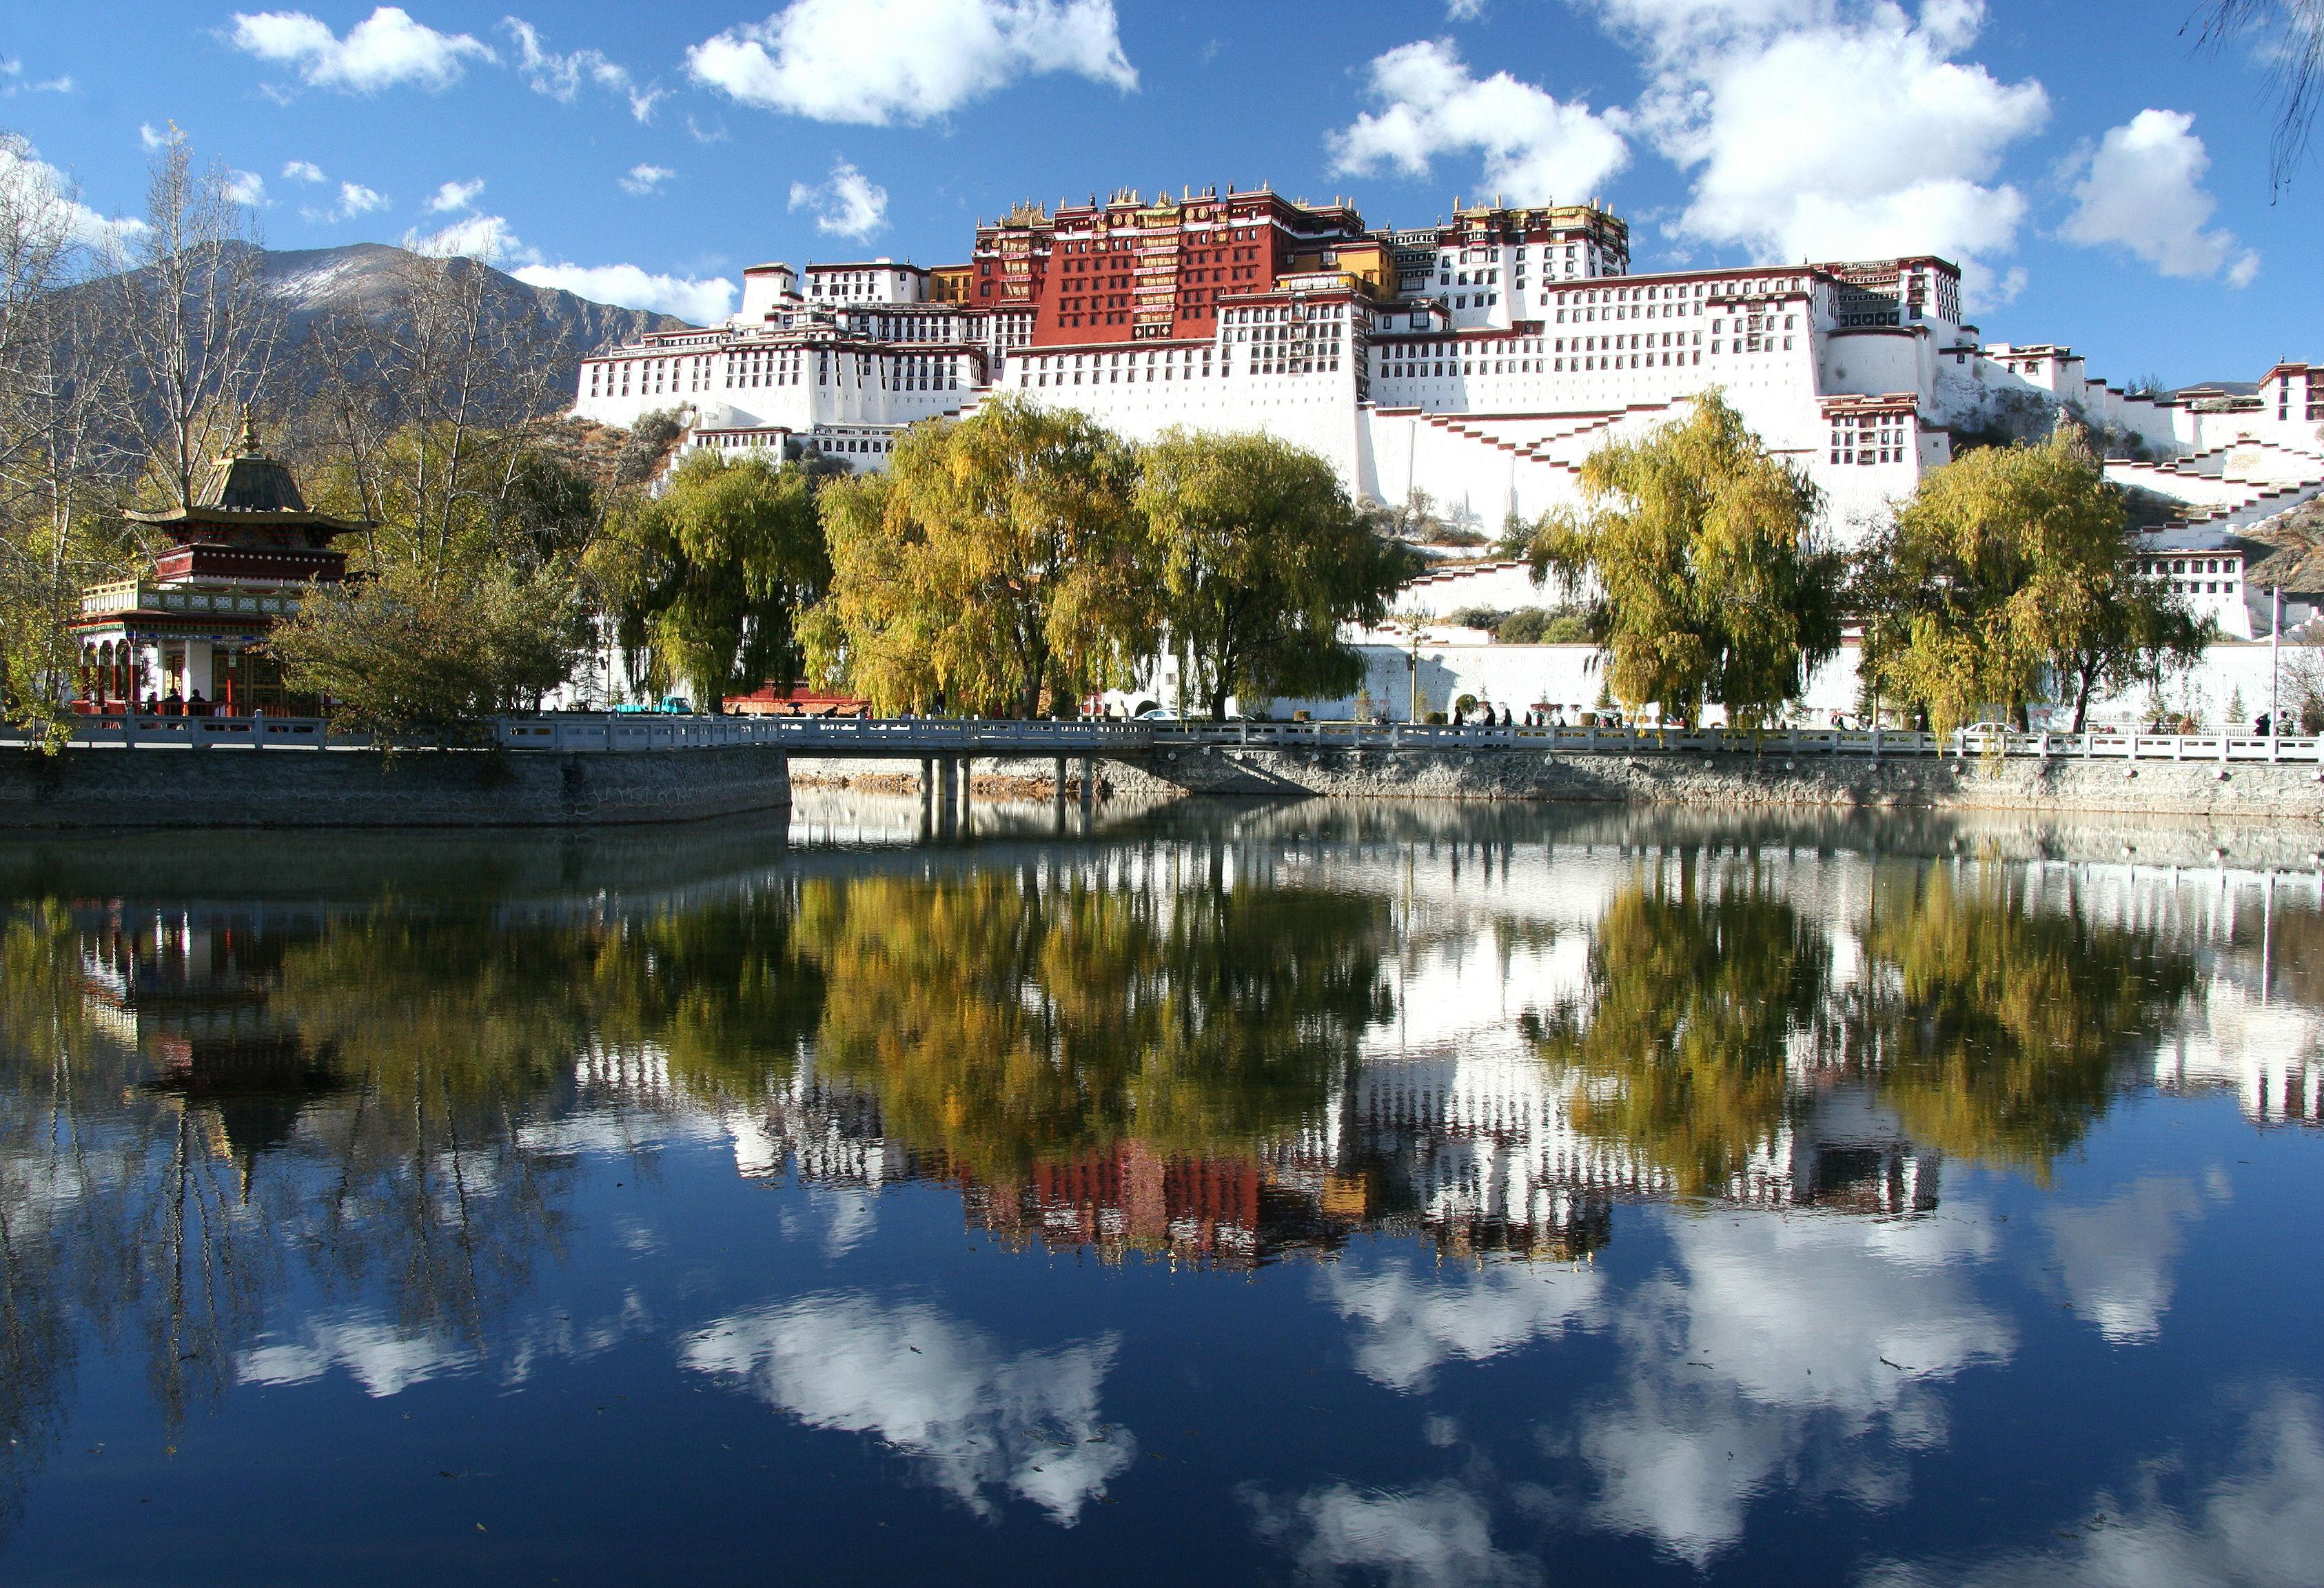 Potala, the Dalai Lama's residence